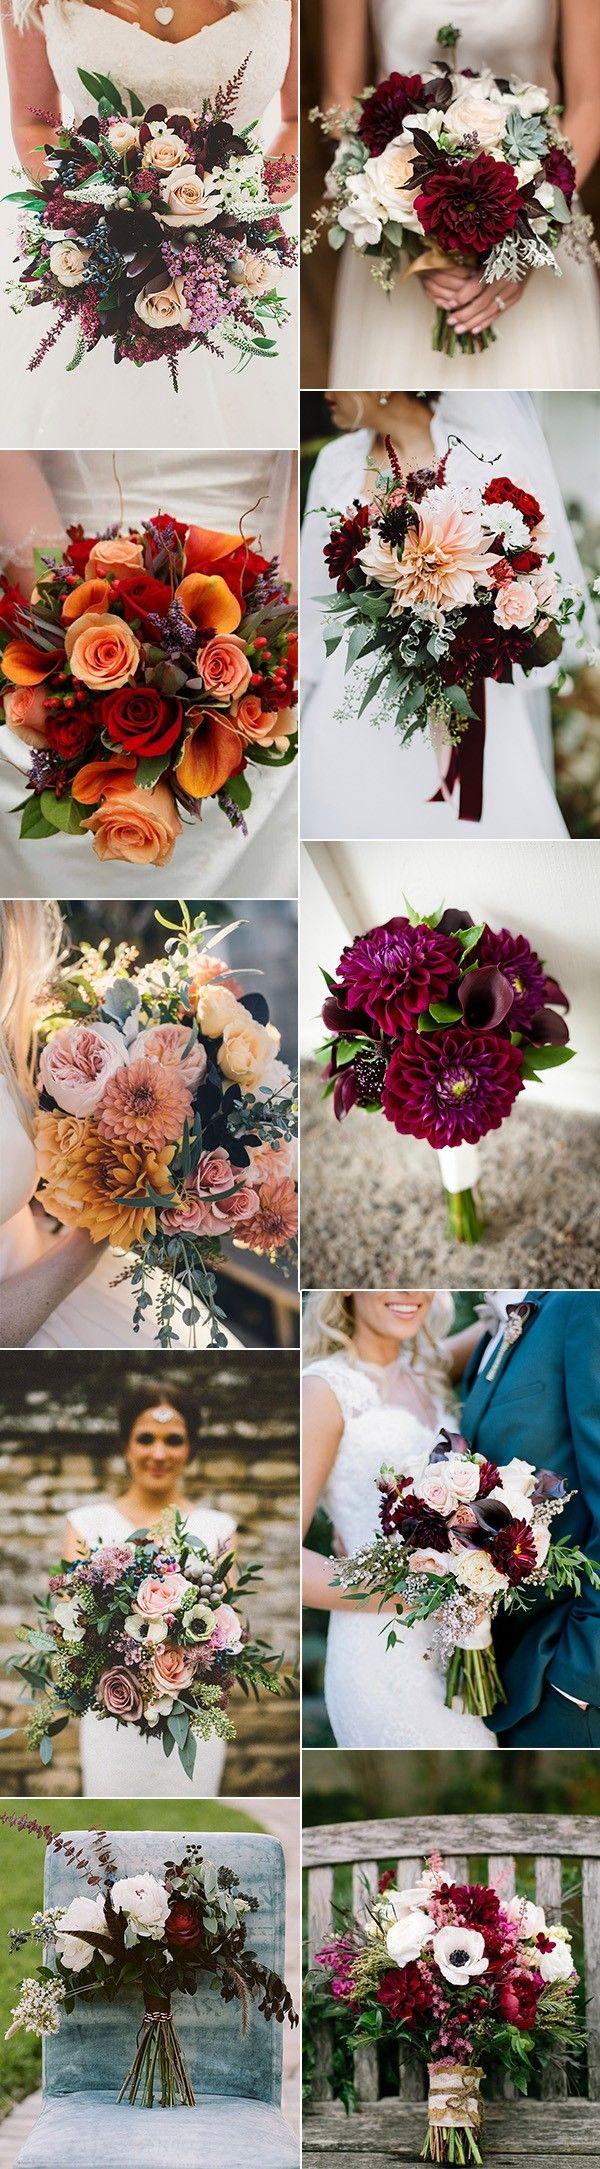 fall wedding bouquets flower ideas